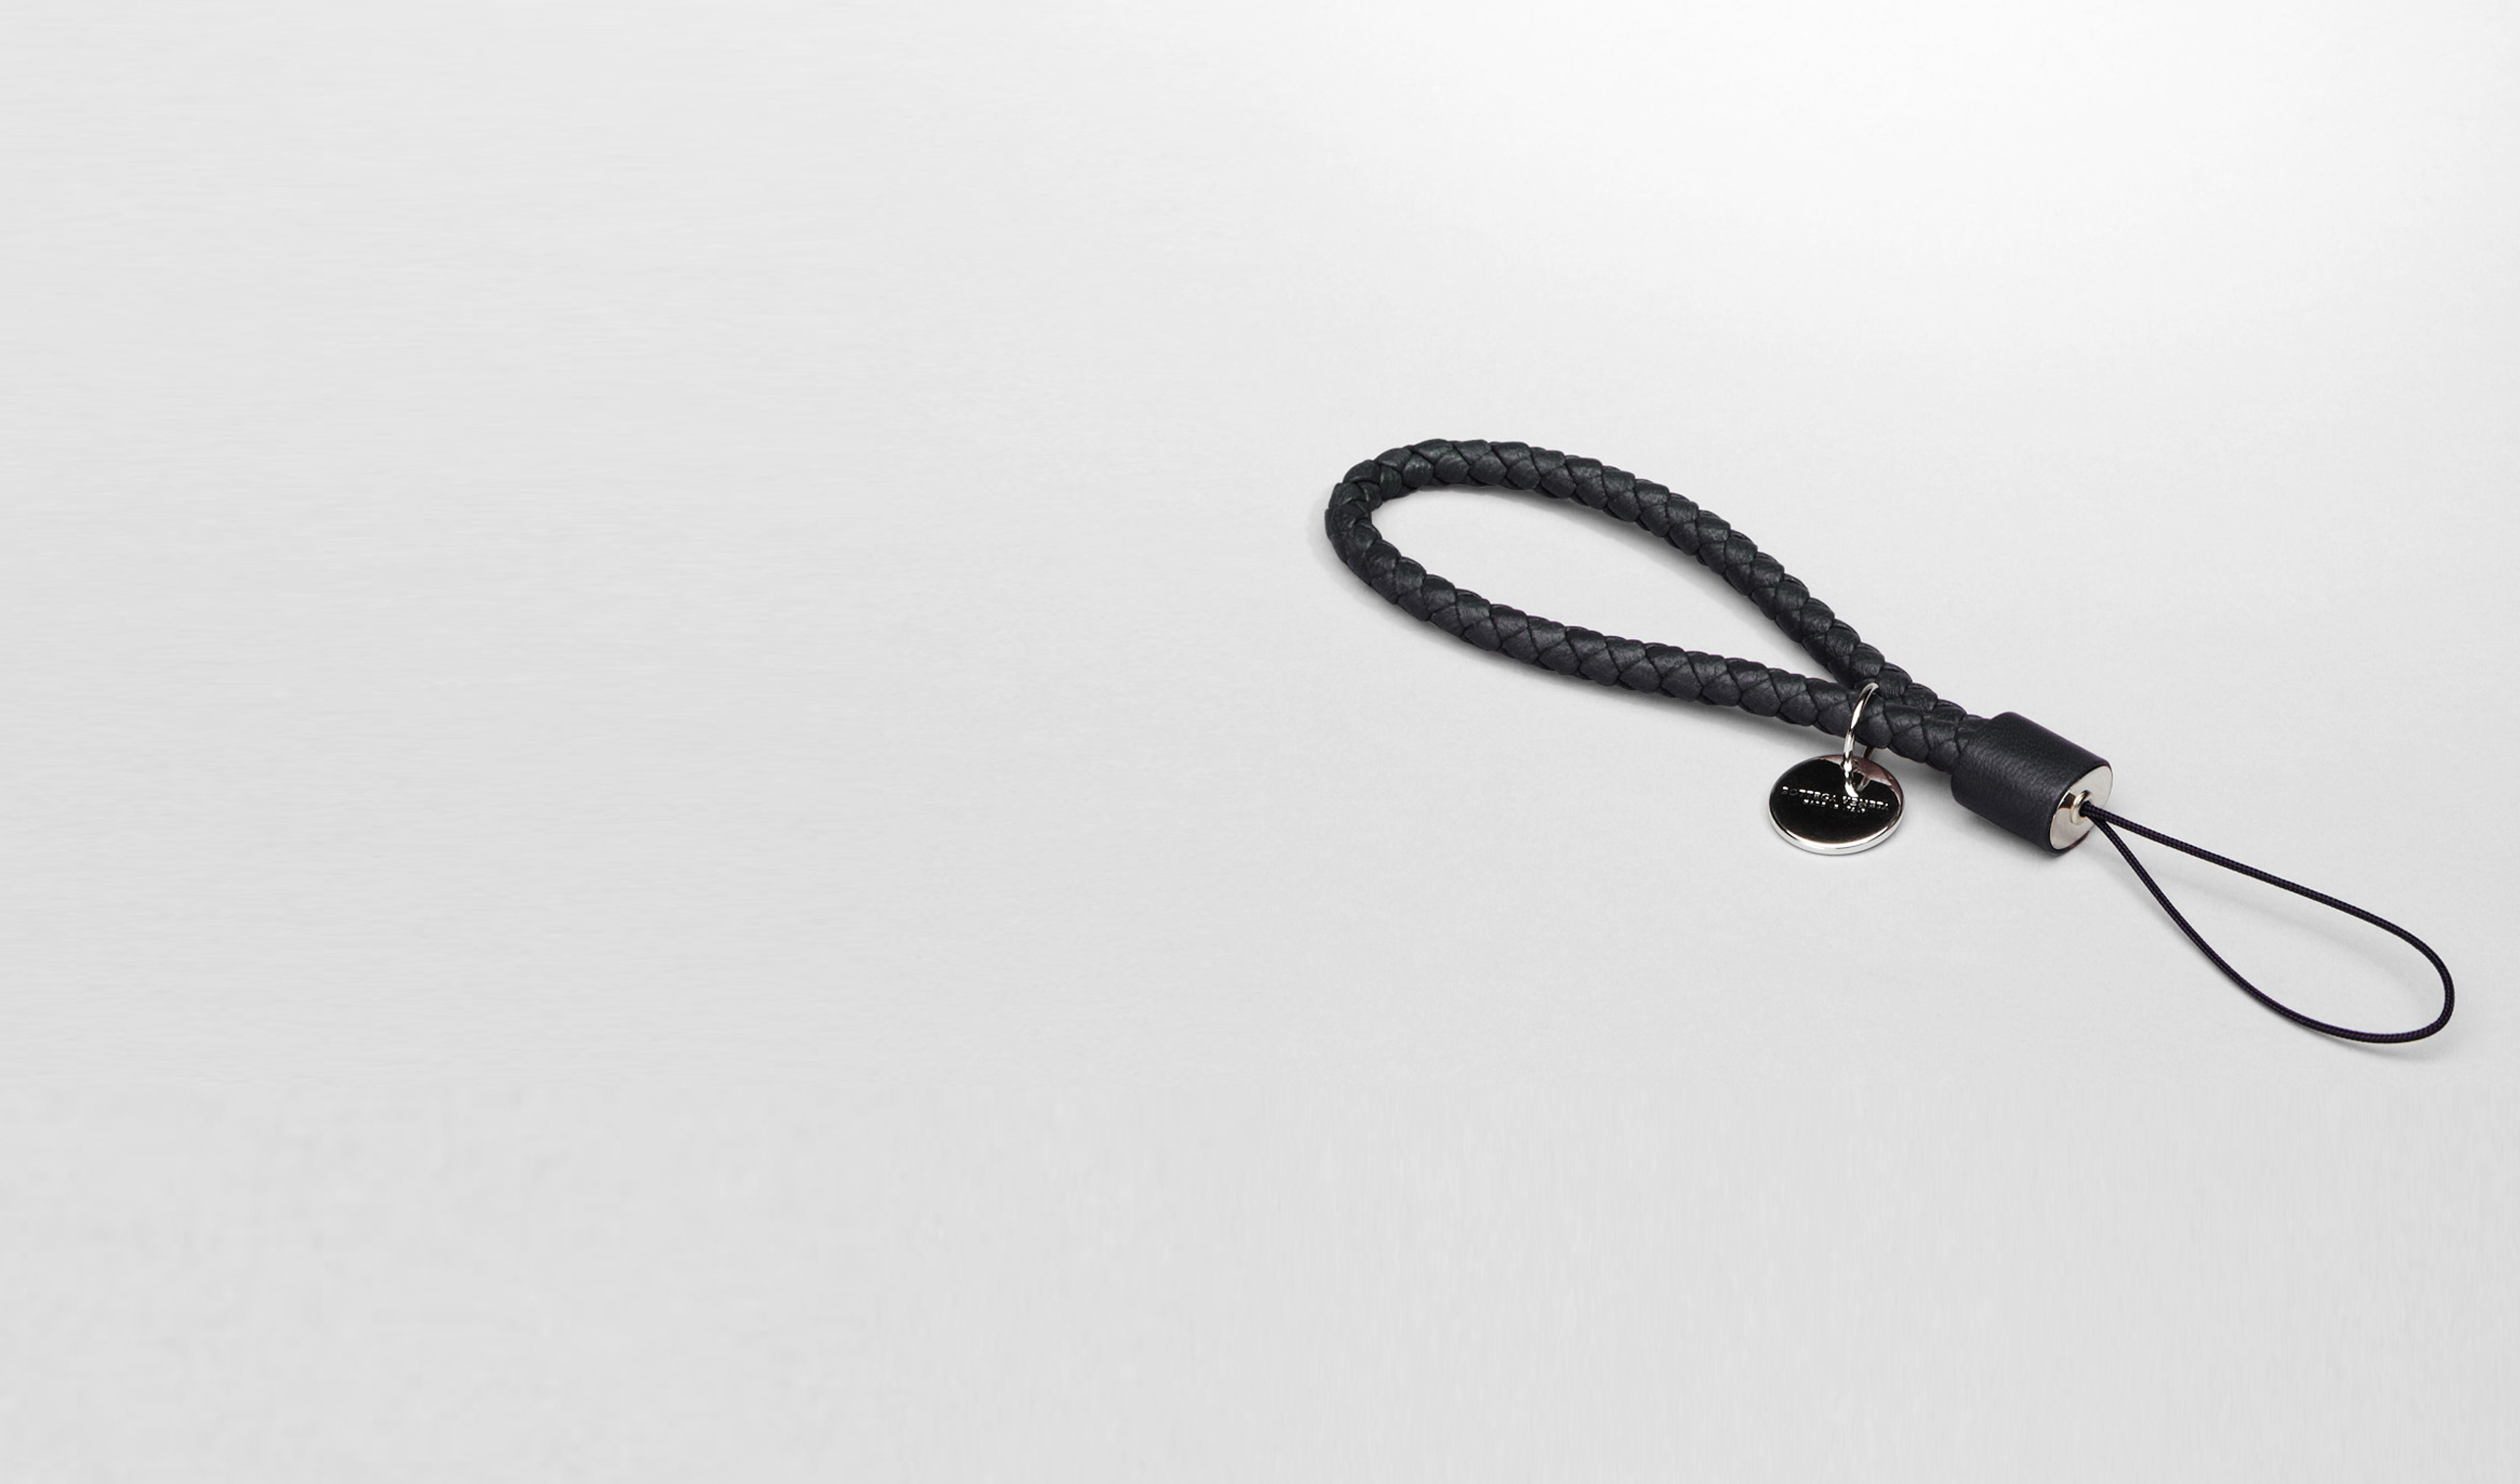 BOTTEGA VENETA Weiteres Leder Accessoire E Handyband aus Nappaleder Intrecciato pl